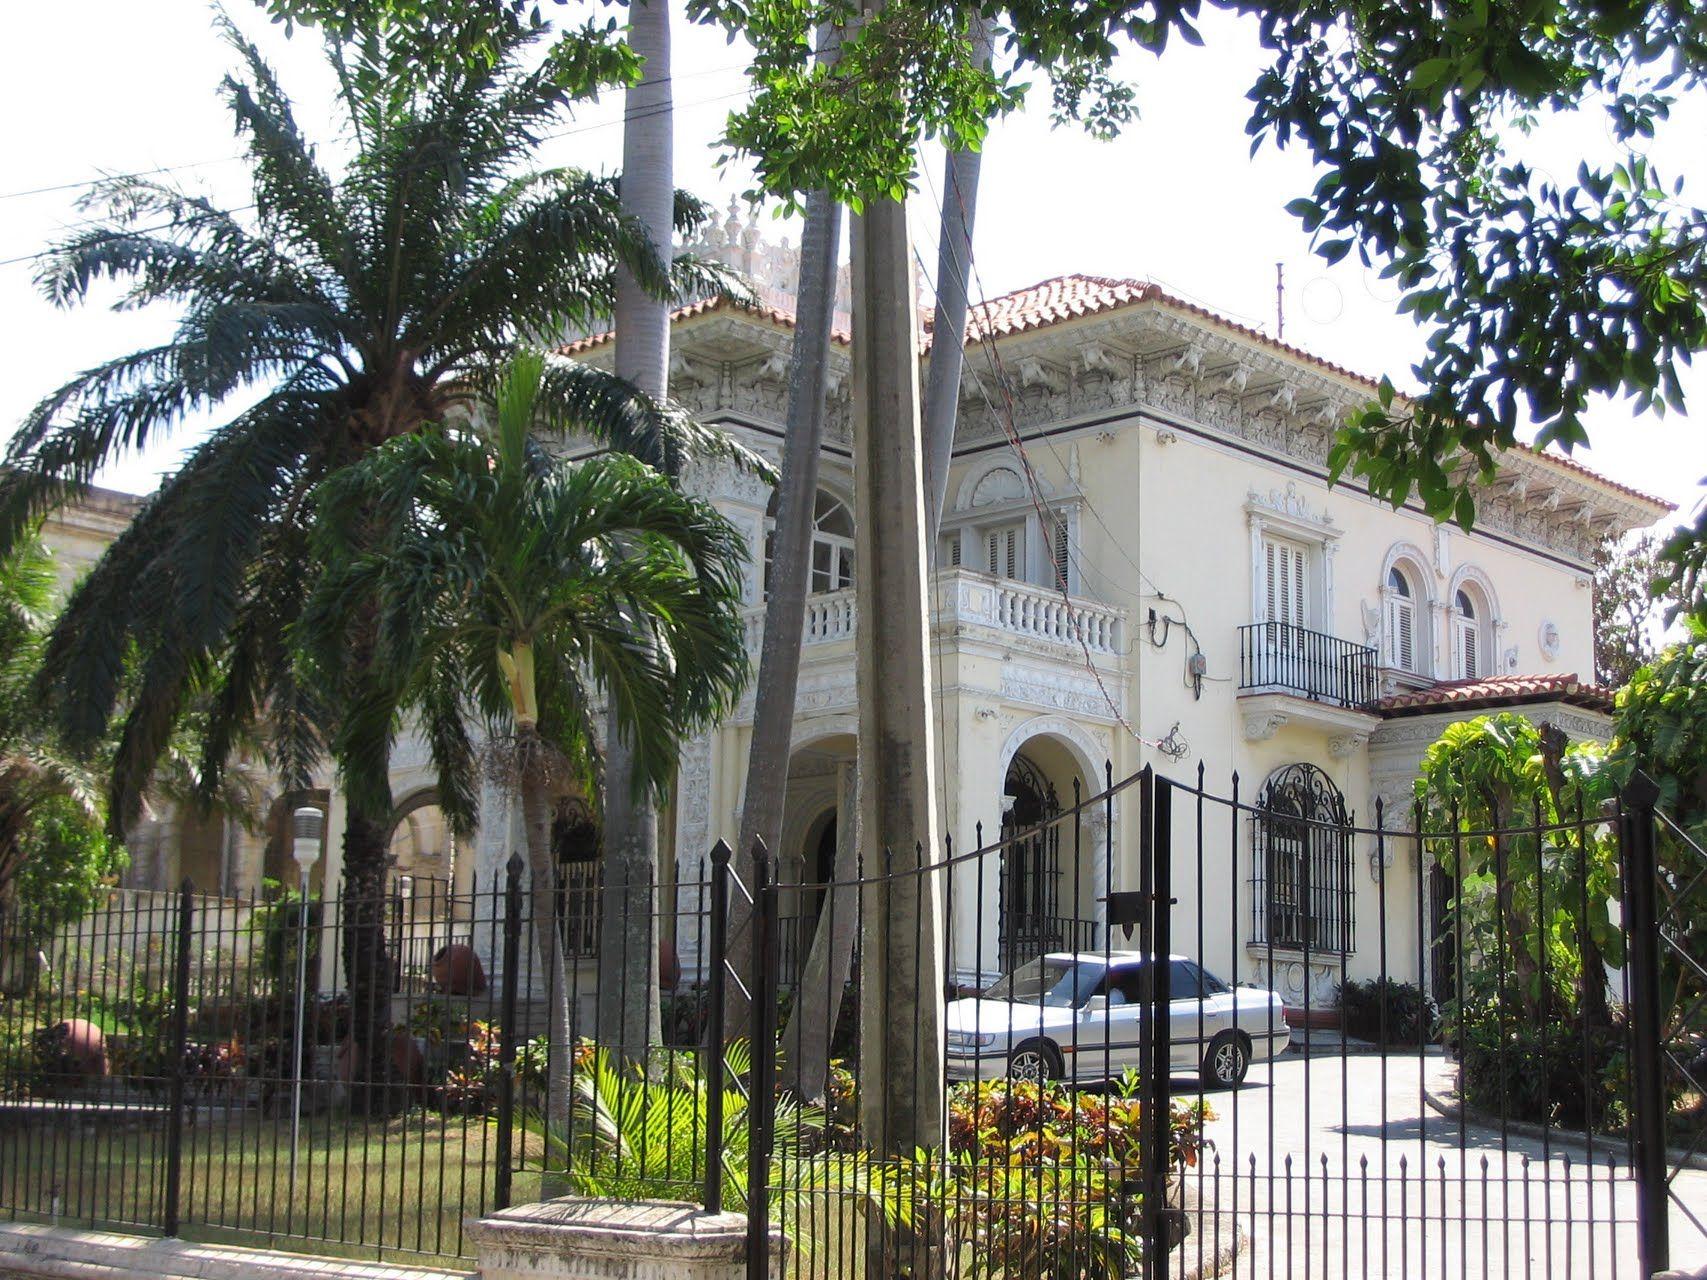 Mansion in Miramar, La Habana, Cuba, by Draken Cuba